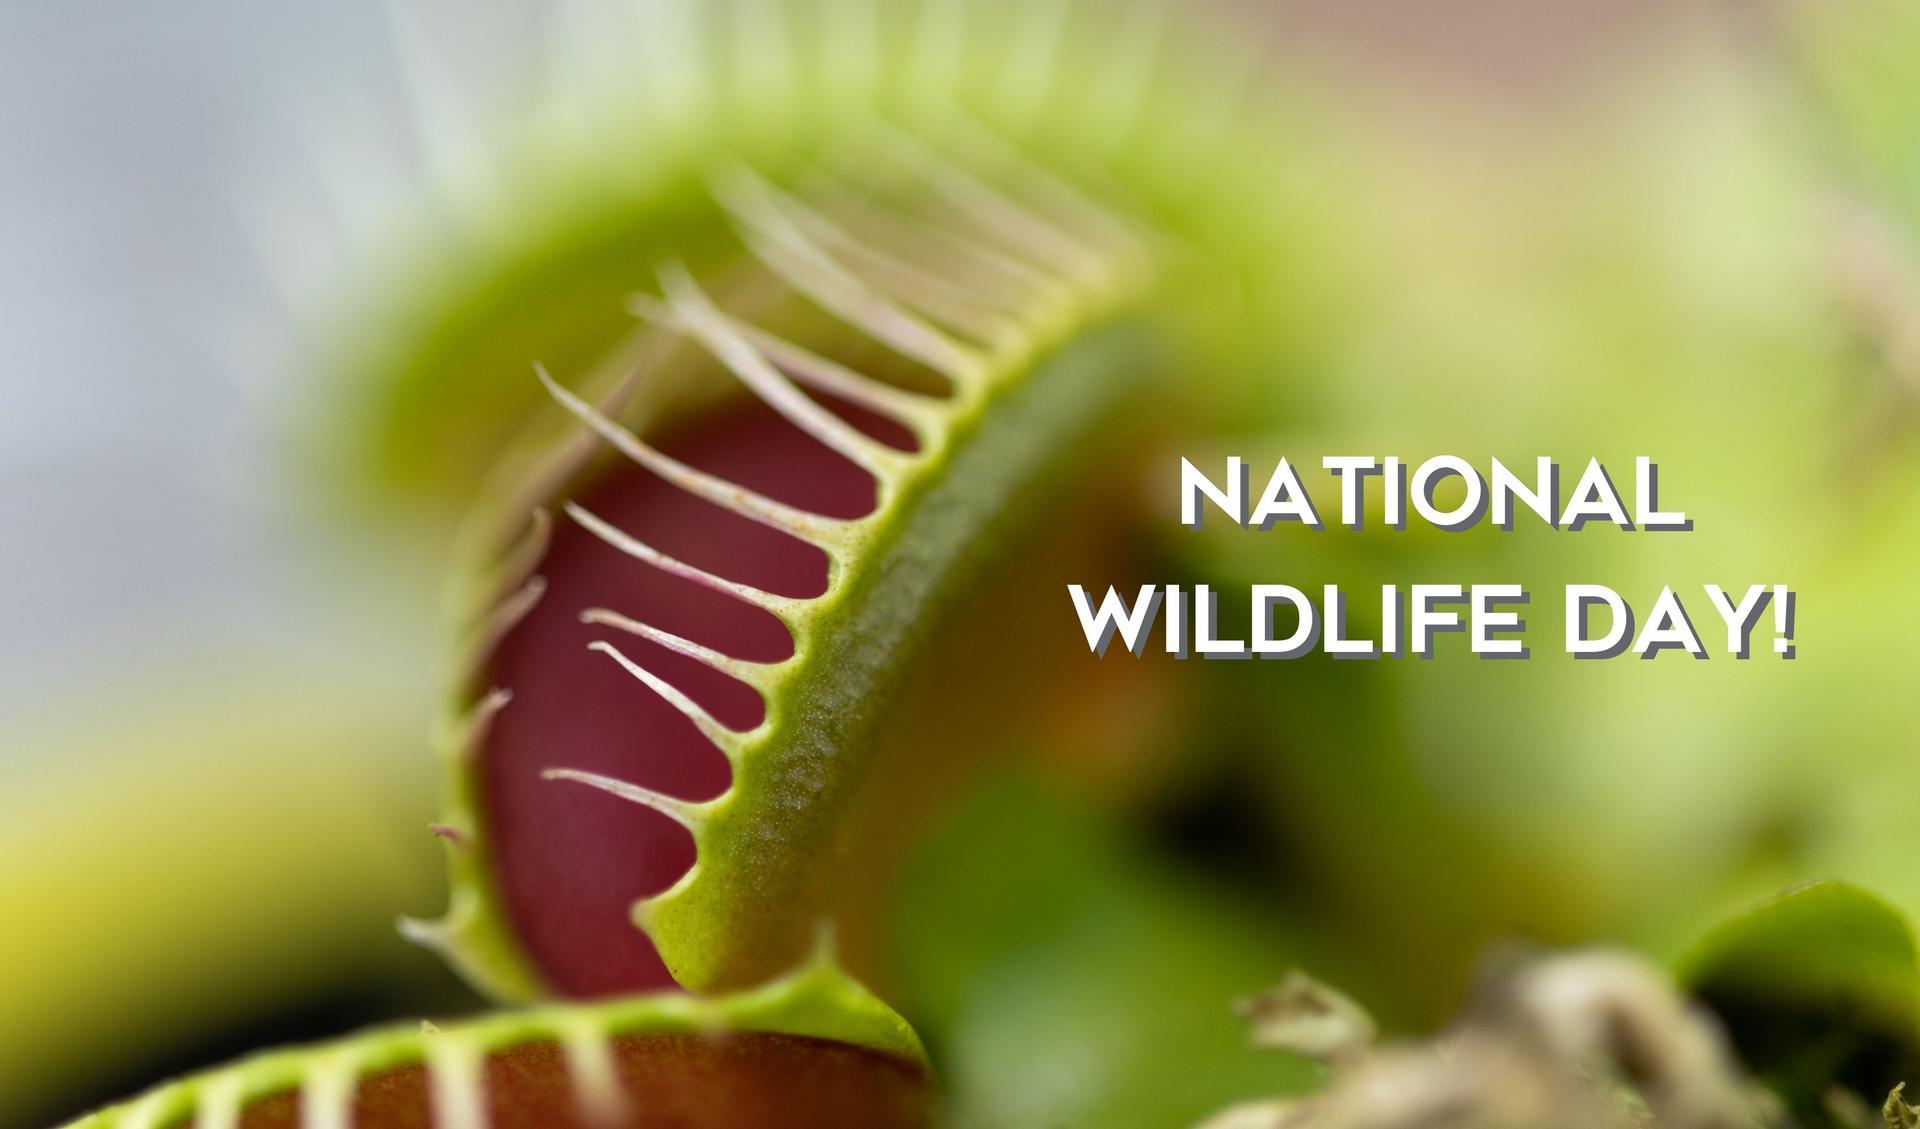 National Wildlife Day! Main Photo